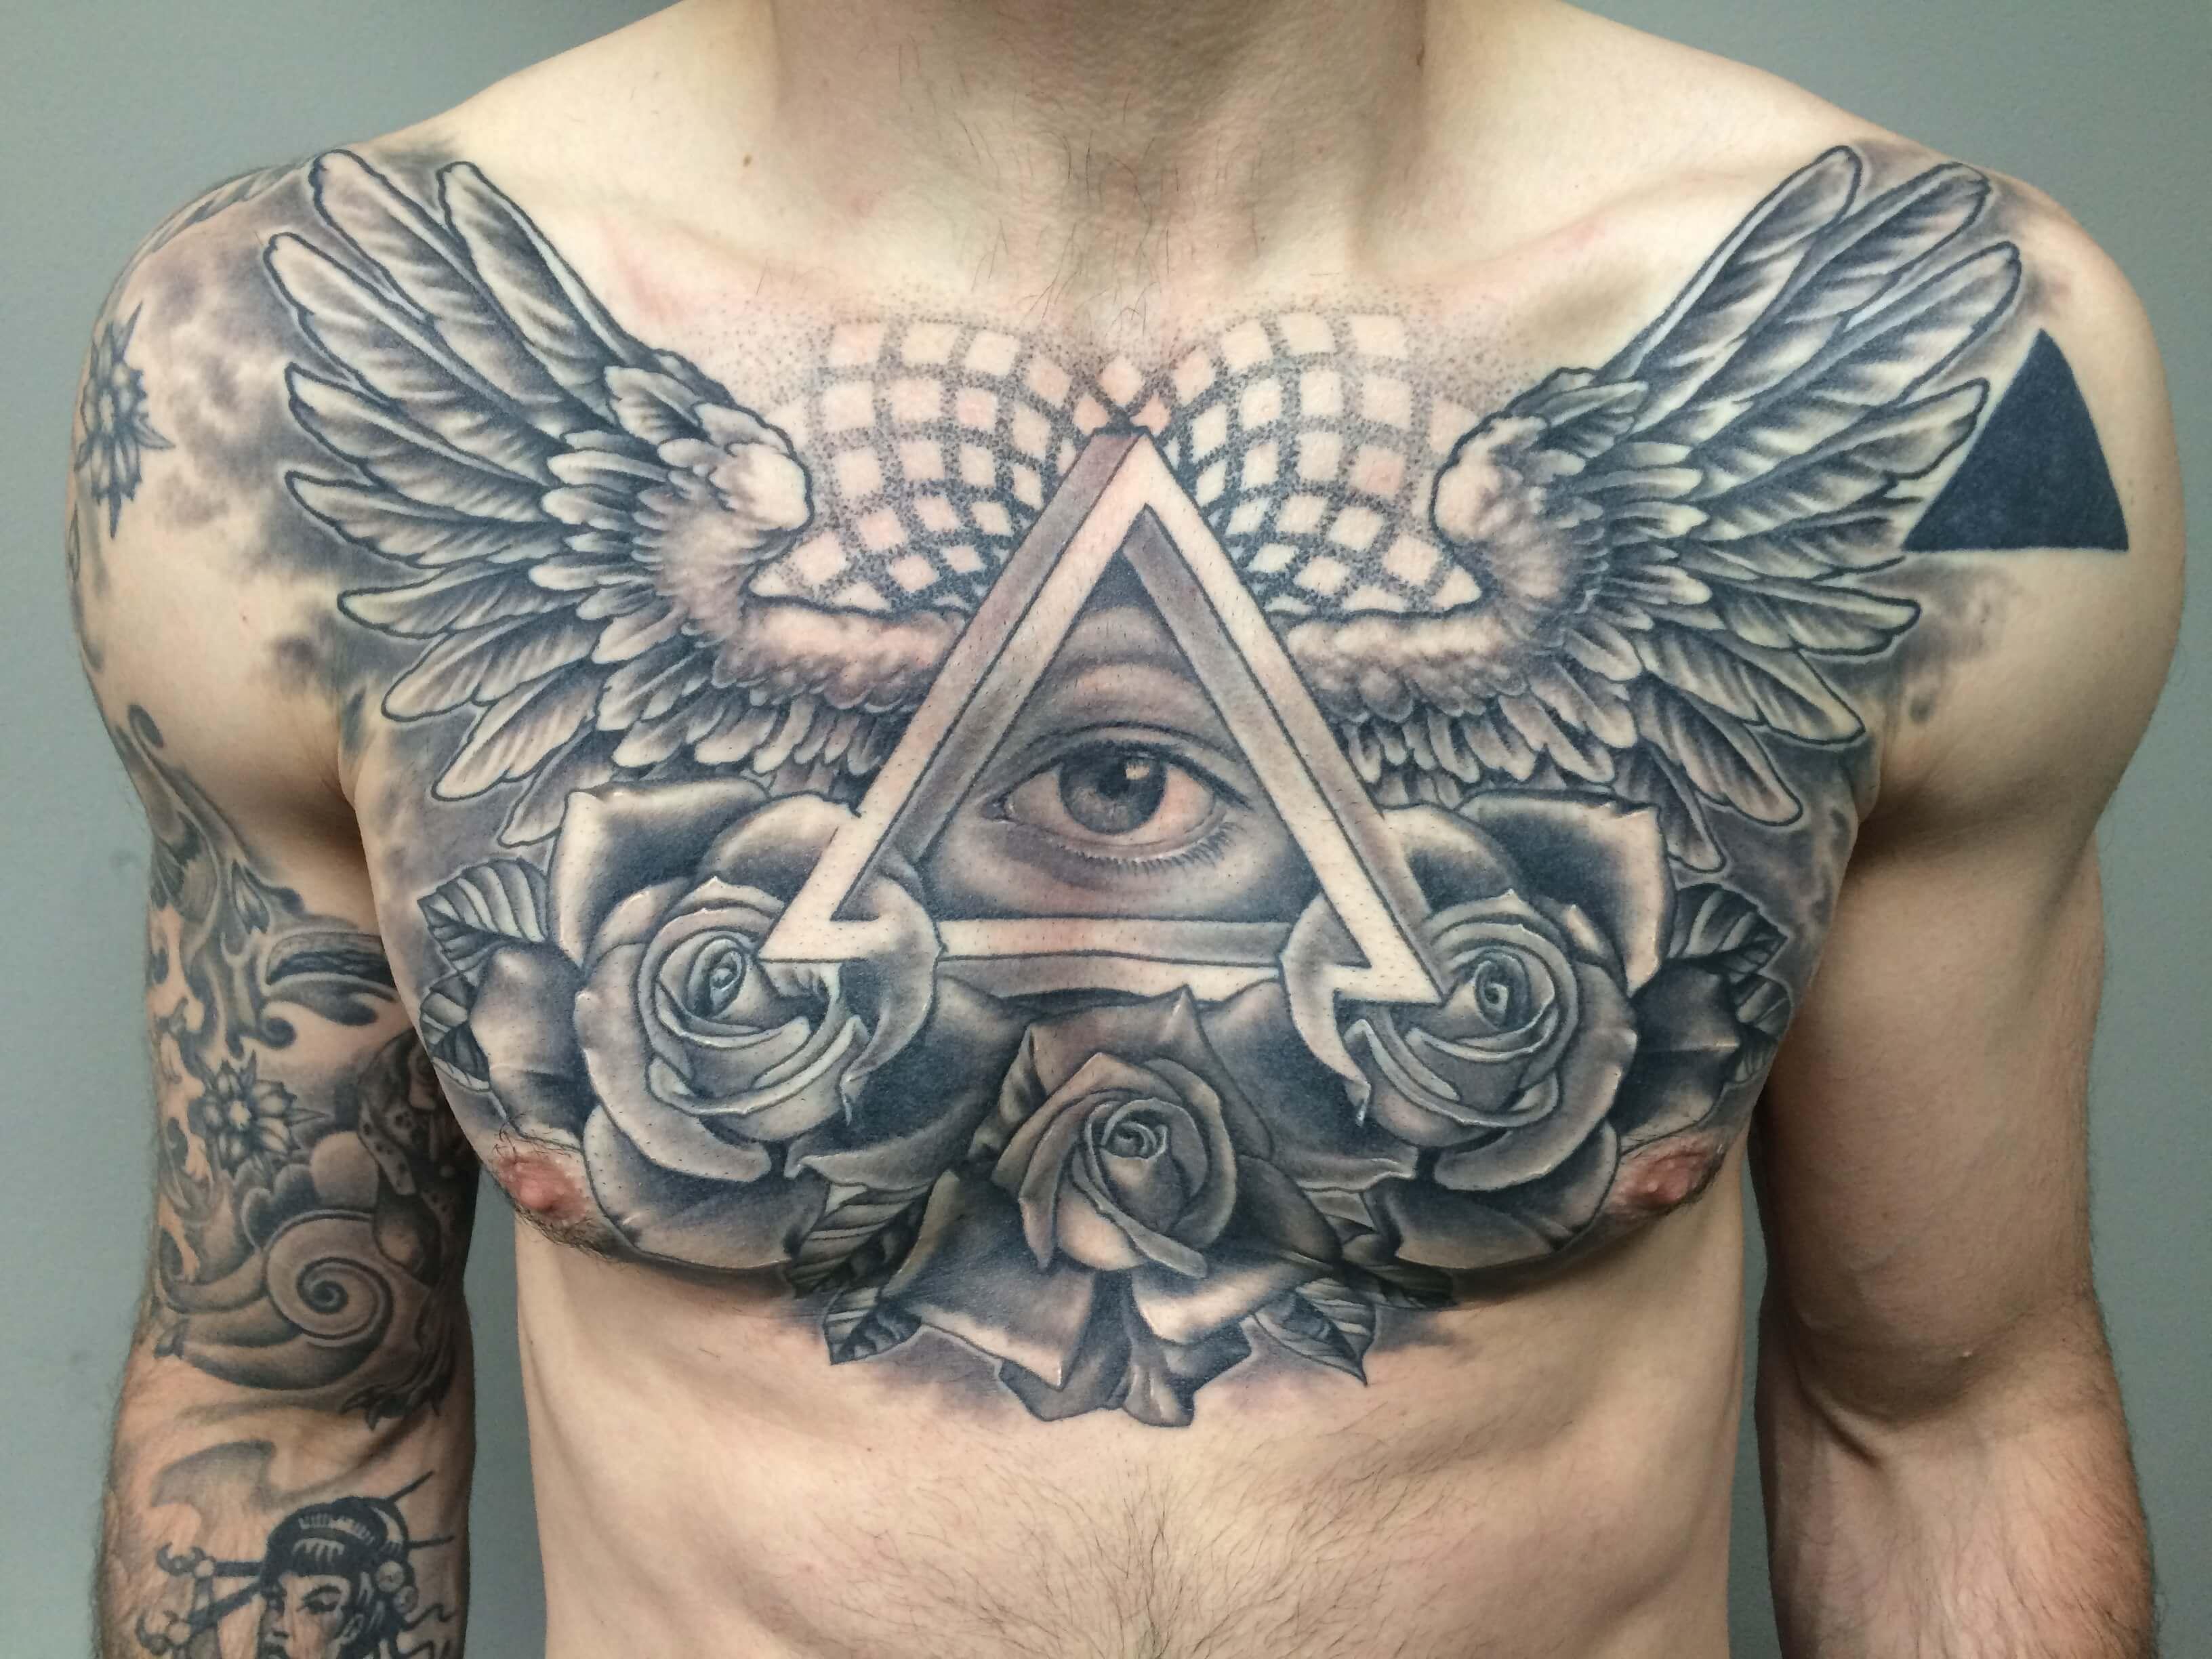 The 100 Best Chest Tattoos For Men Improb regarding sizing 3264 X 2448